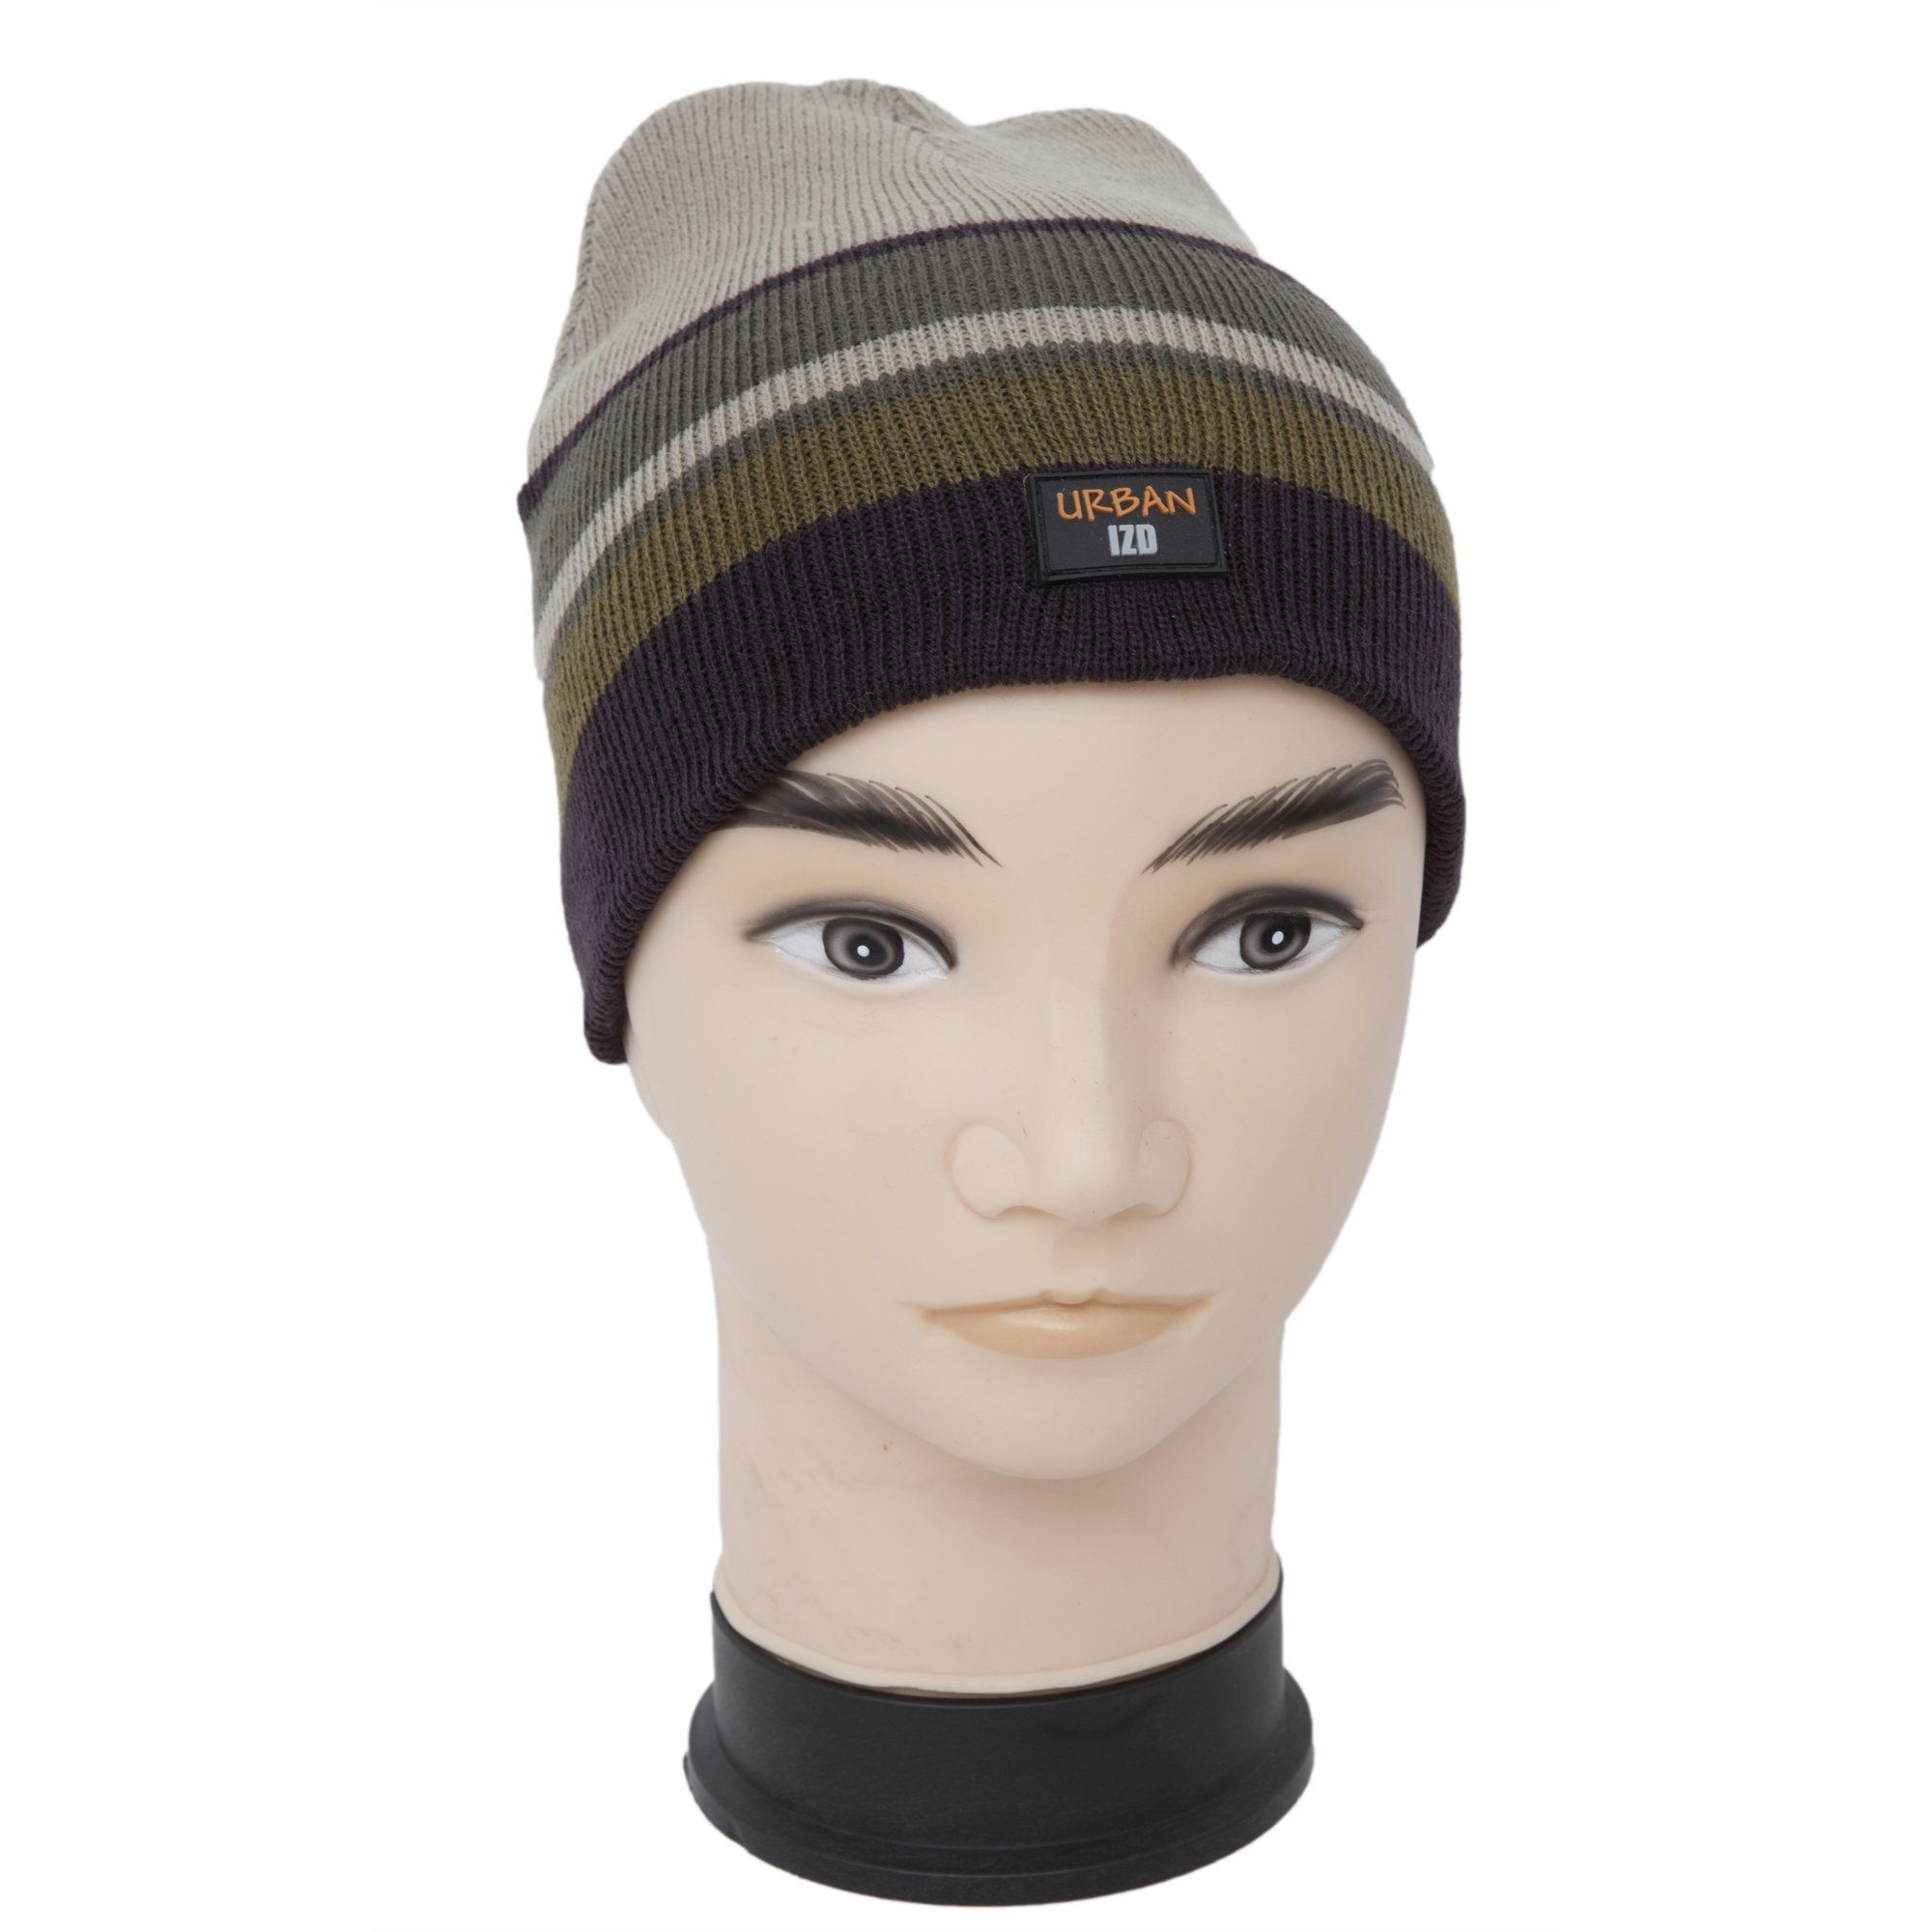 LADIES THERMAL THINSULATE  BEANIE CROCHET WINTER  SKI BOBBLE HAT